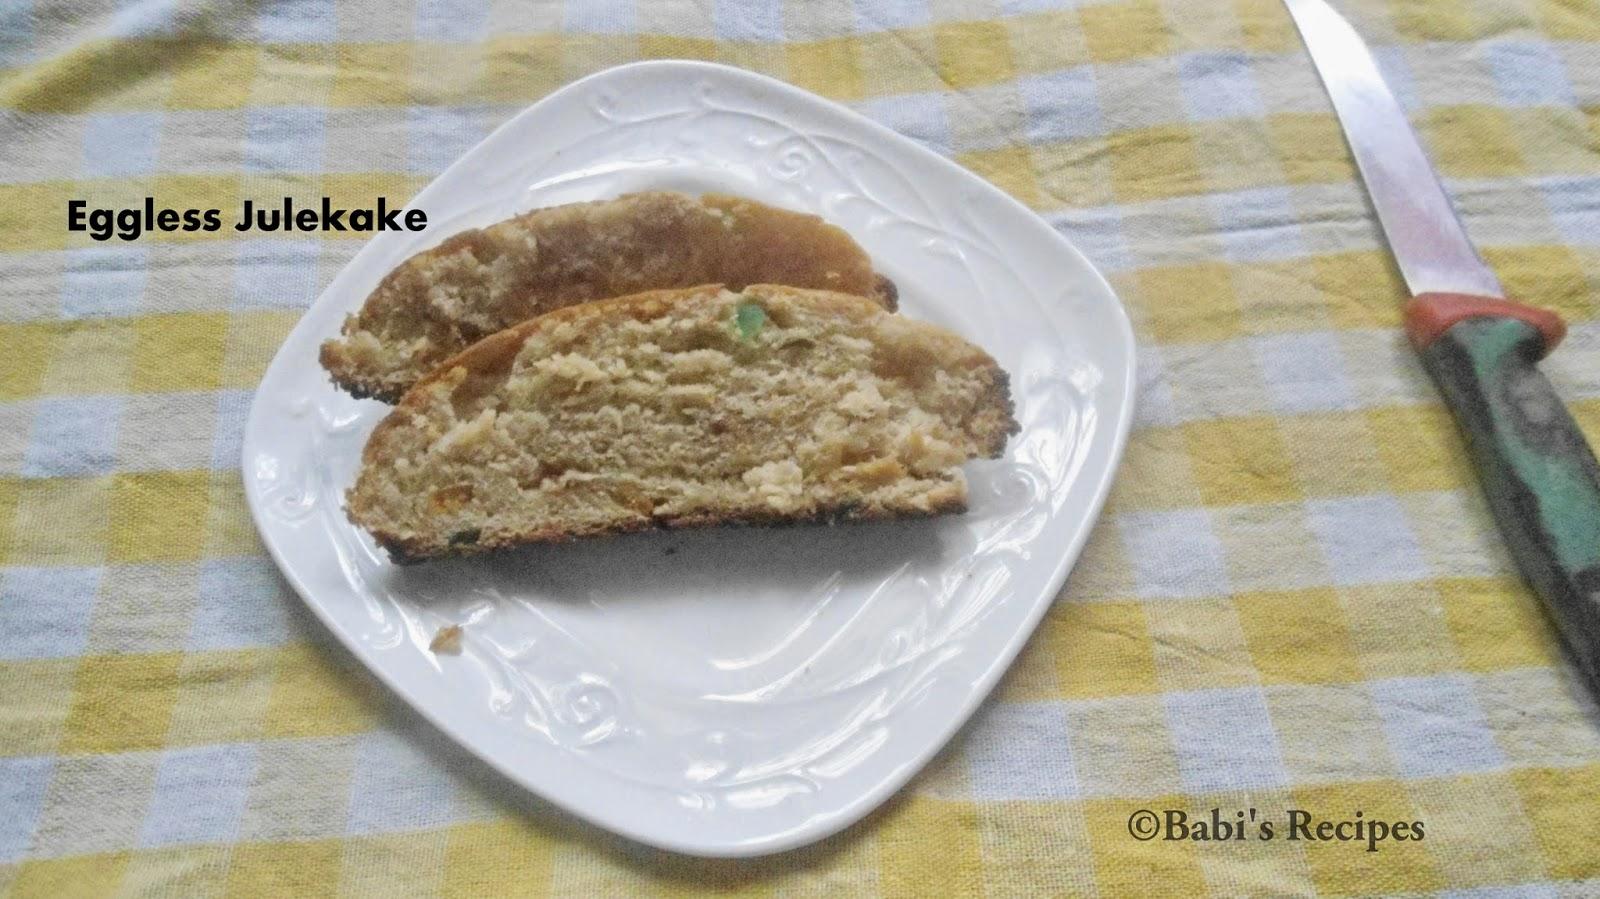 Babi \'s Recipes: Julekake - Norwegian Christmas Bread | Eggless ...